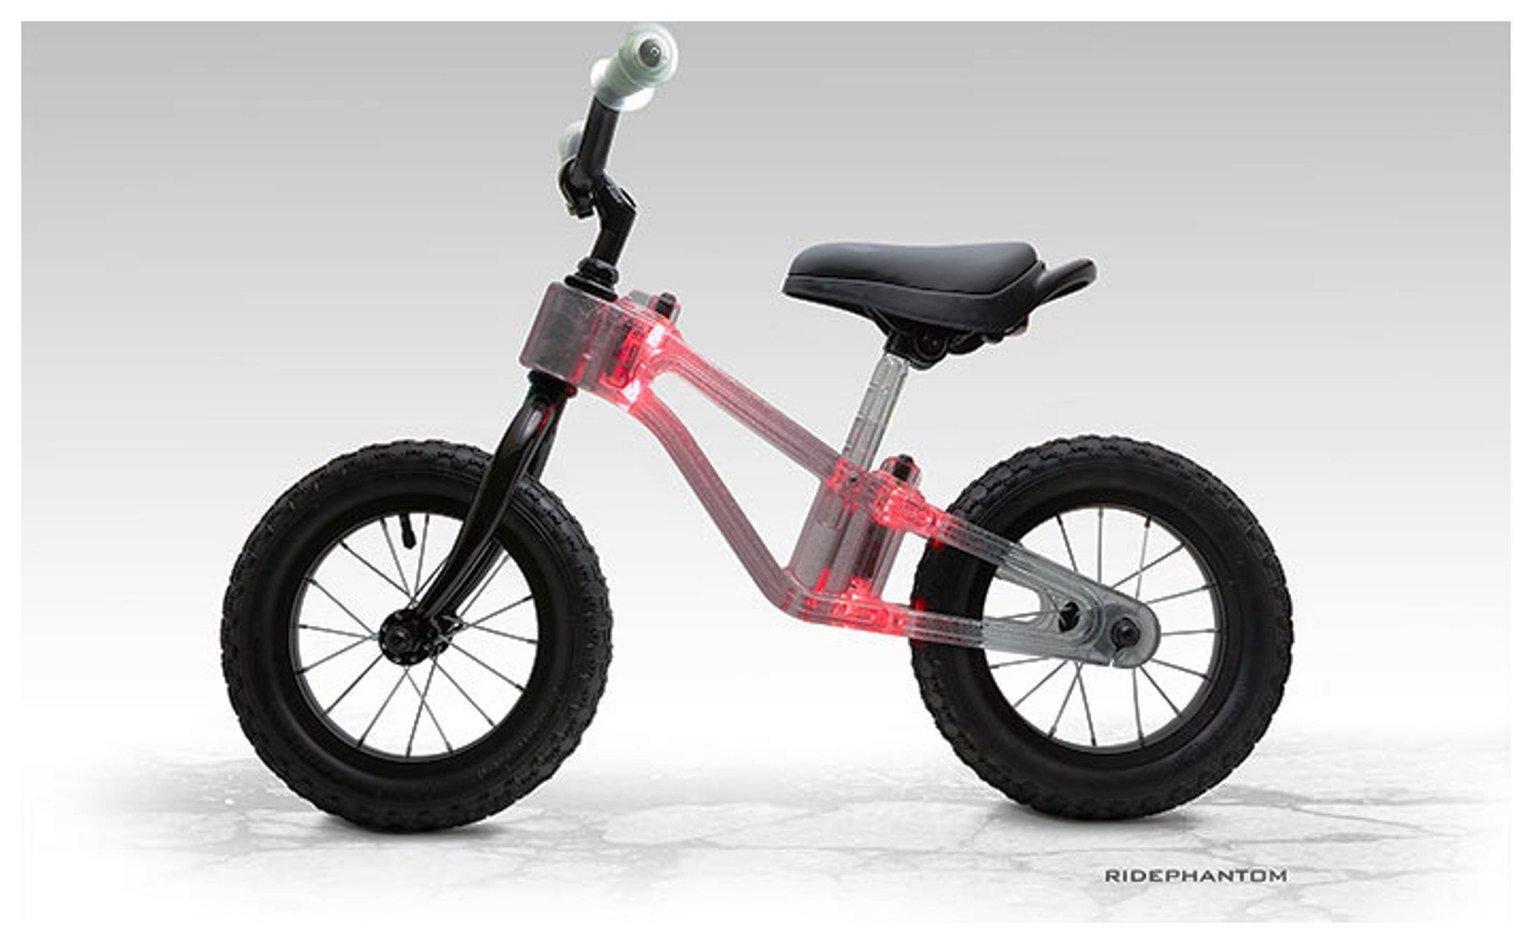 Phantom 12 Inch Red Balance Bike